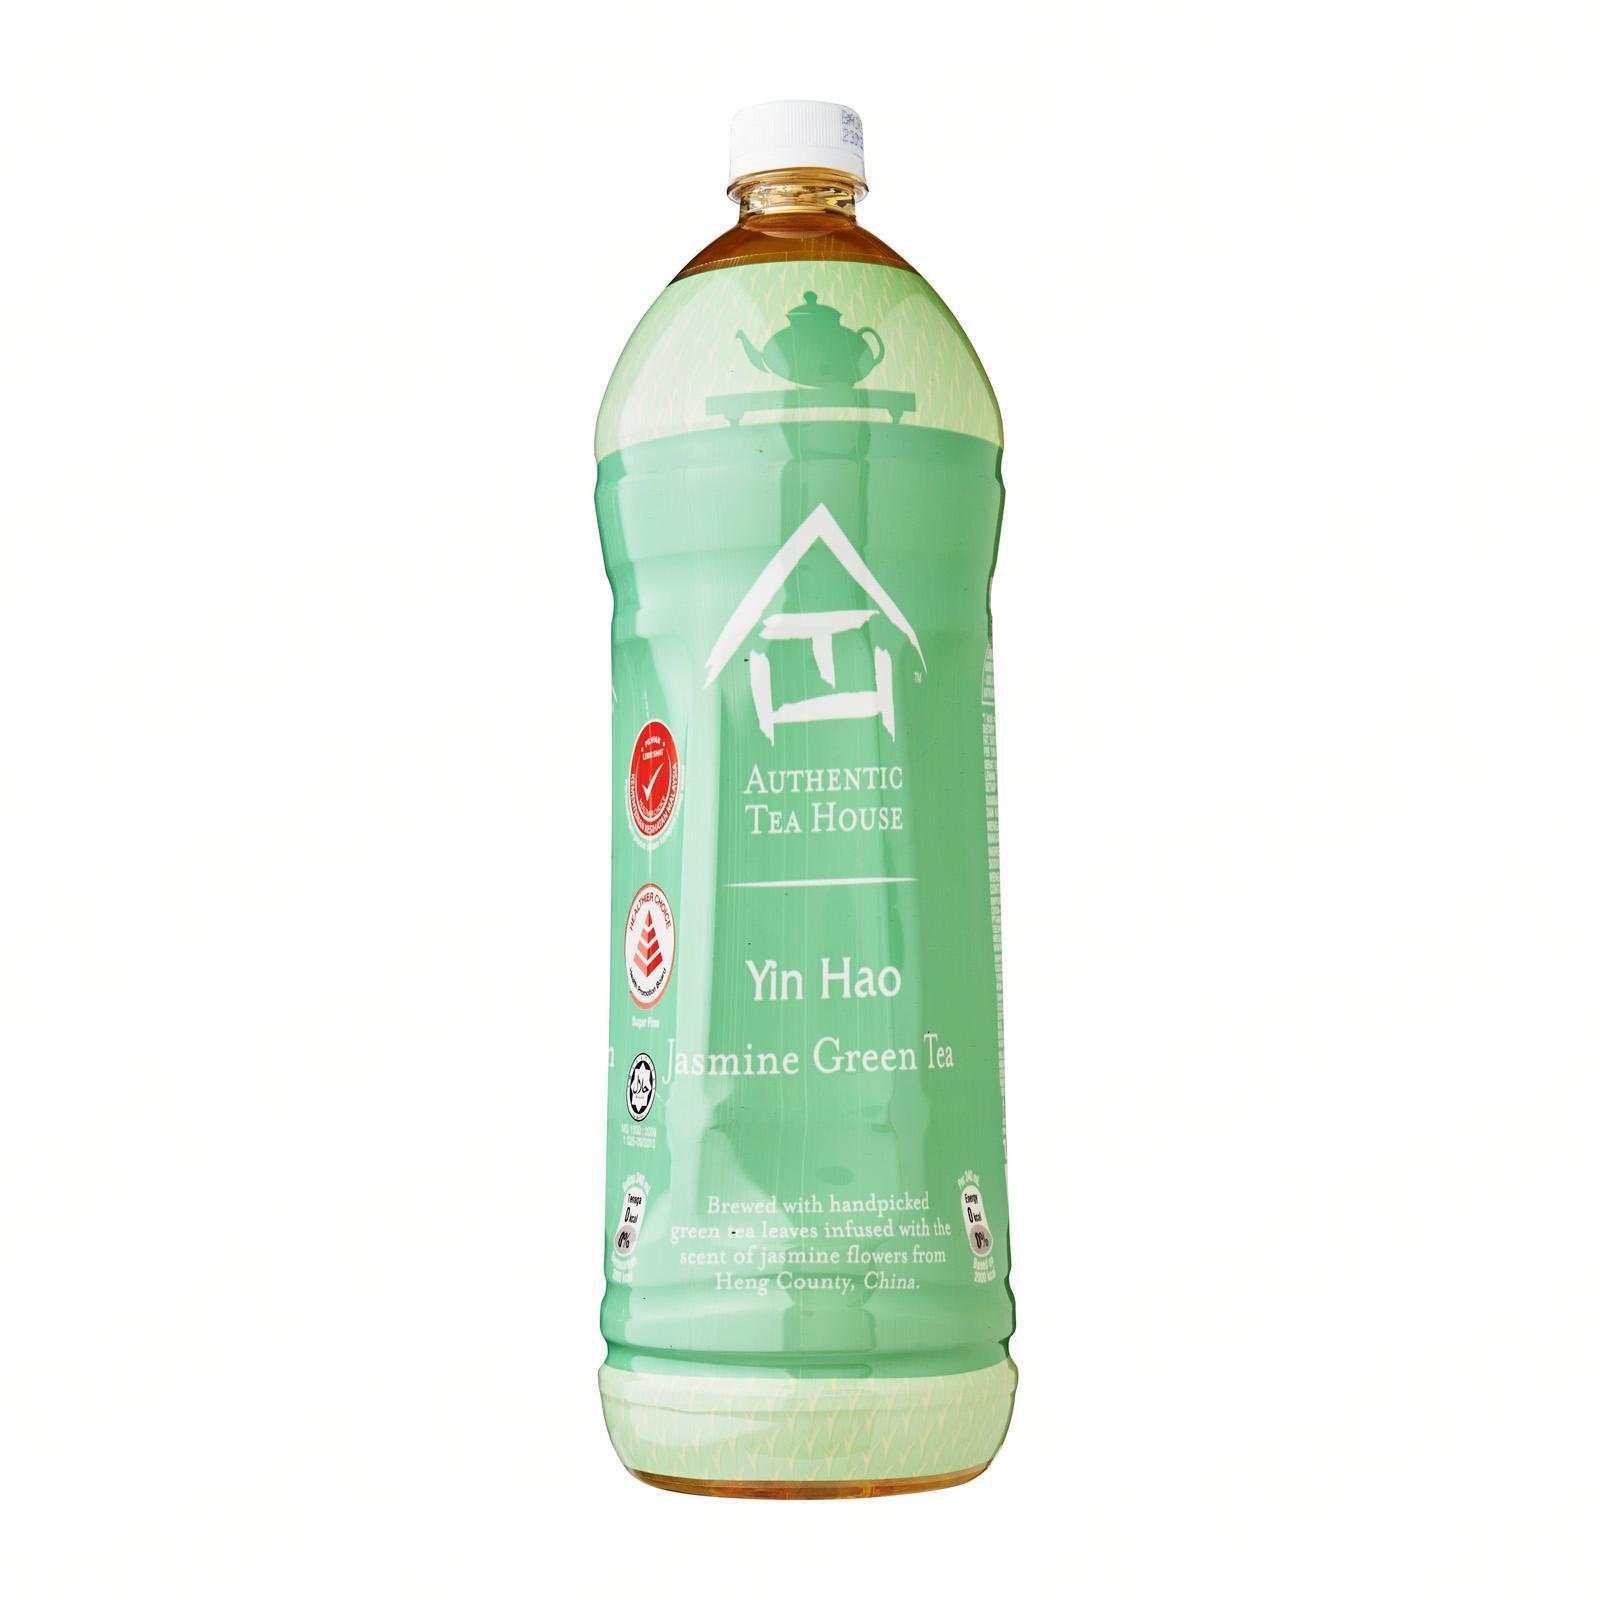 Authentic Tea House Yin Hao Unsweetened Jasmine Green Tea (1.5L)